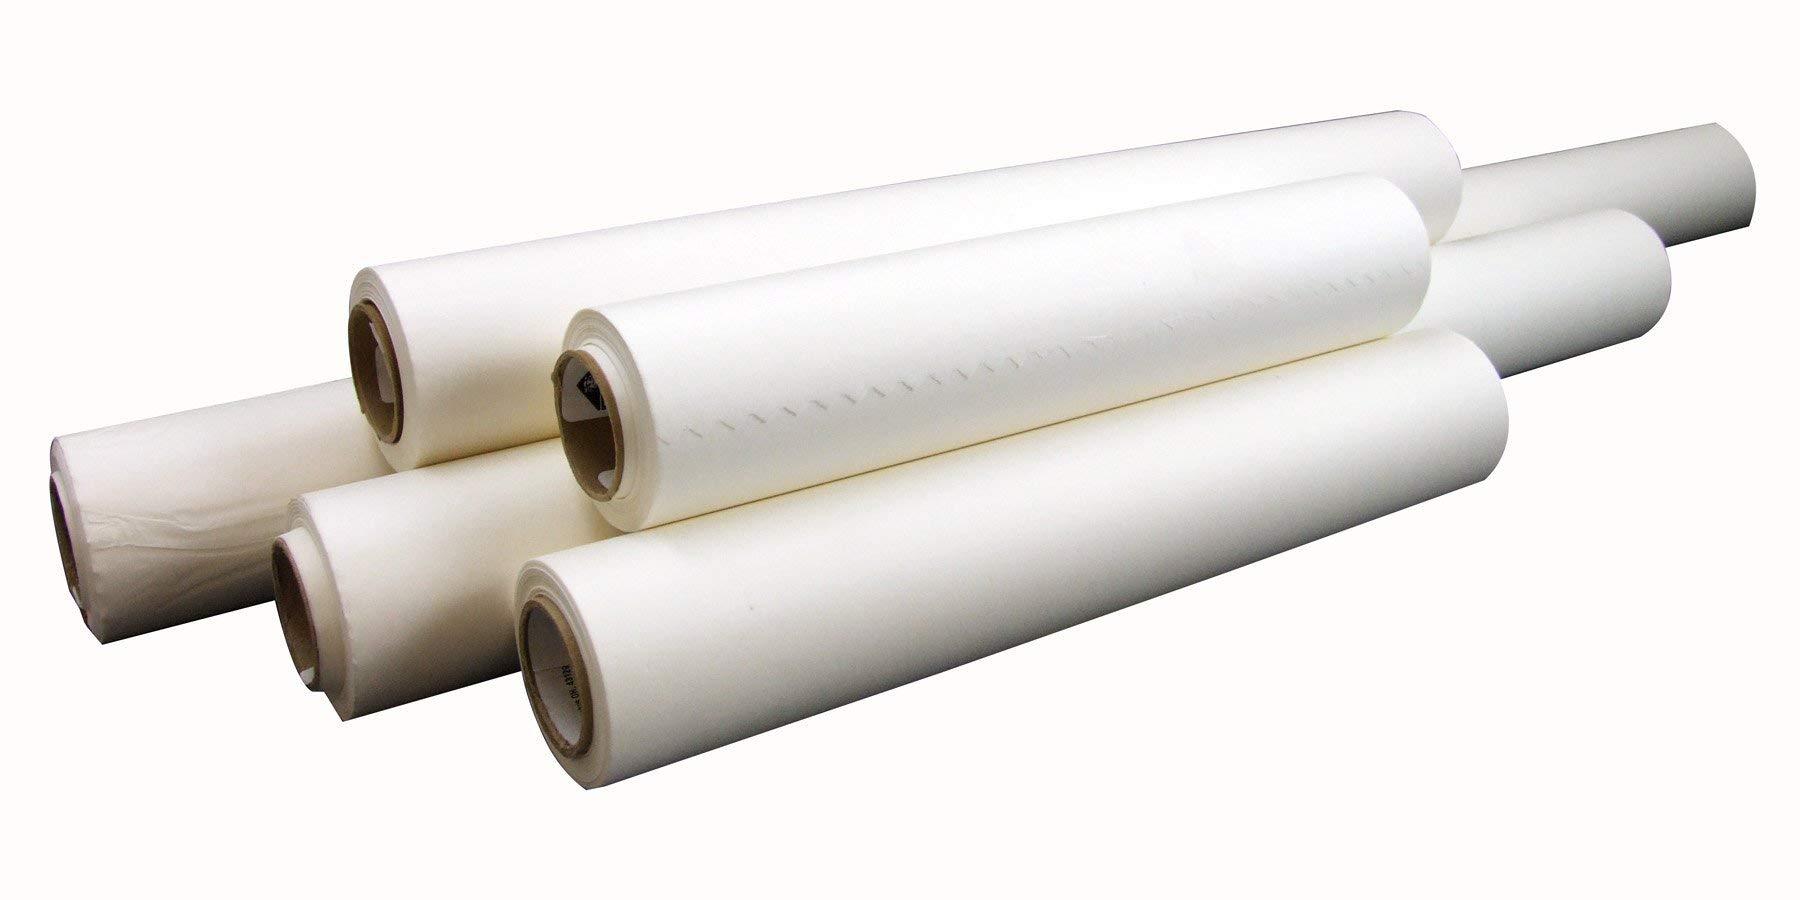 Bienfang 50 YDS by 12IN wide Sketching and Tracing Paper Roll. (340134) by Bienfang